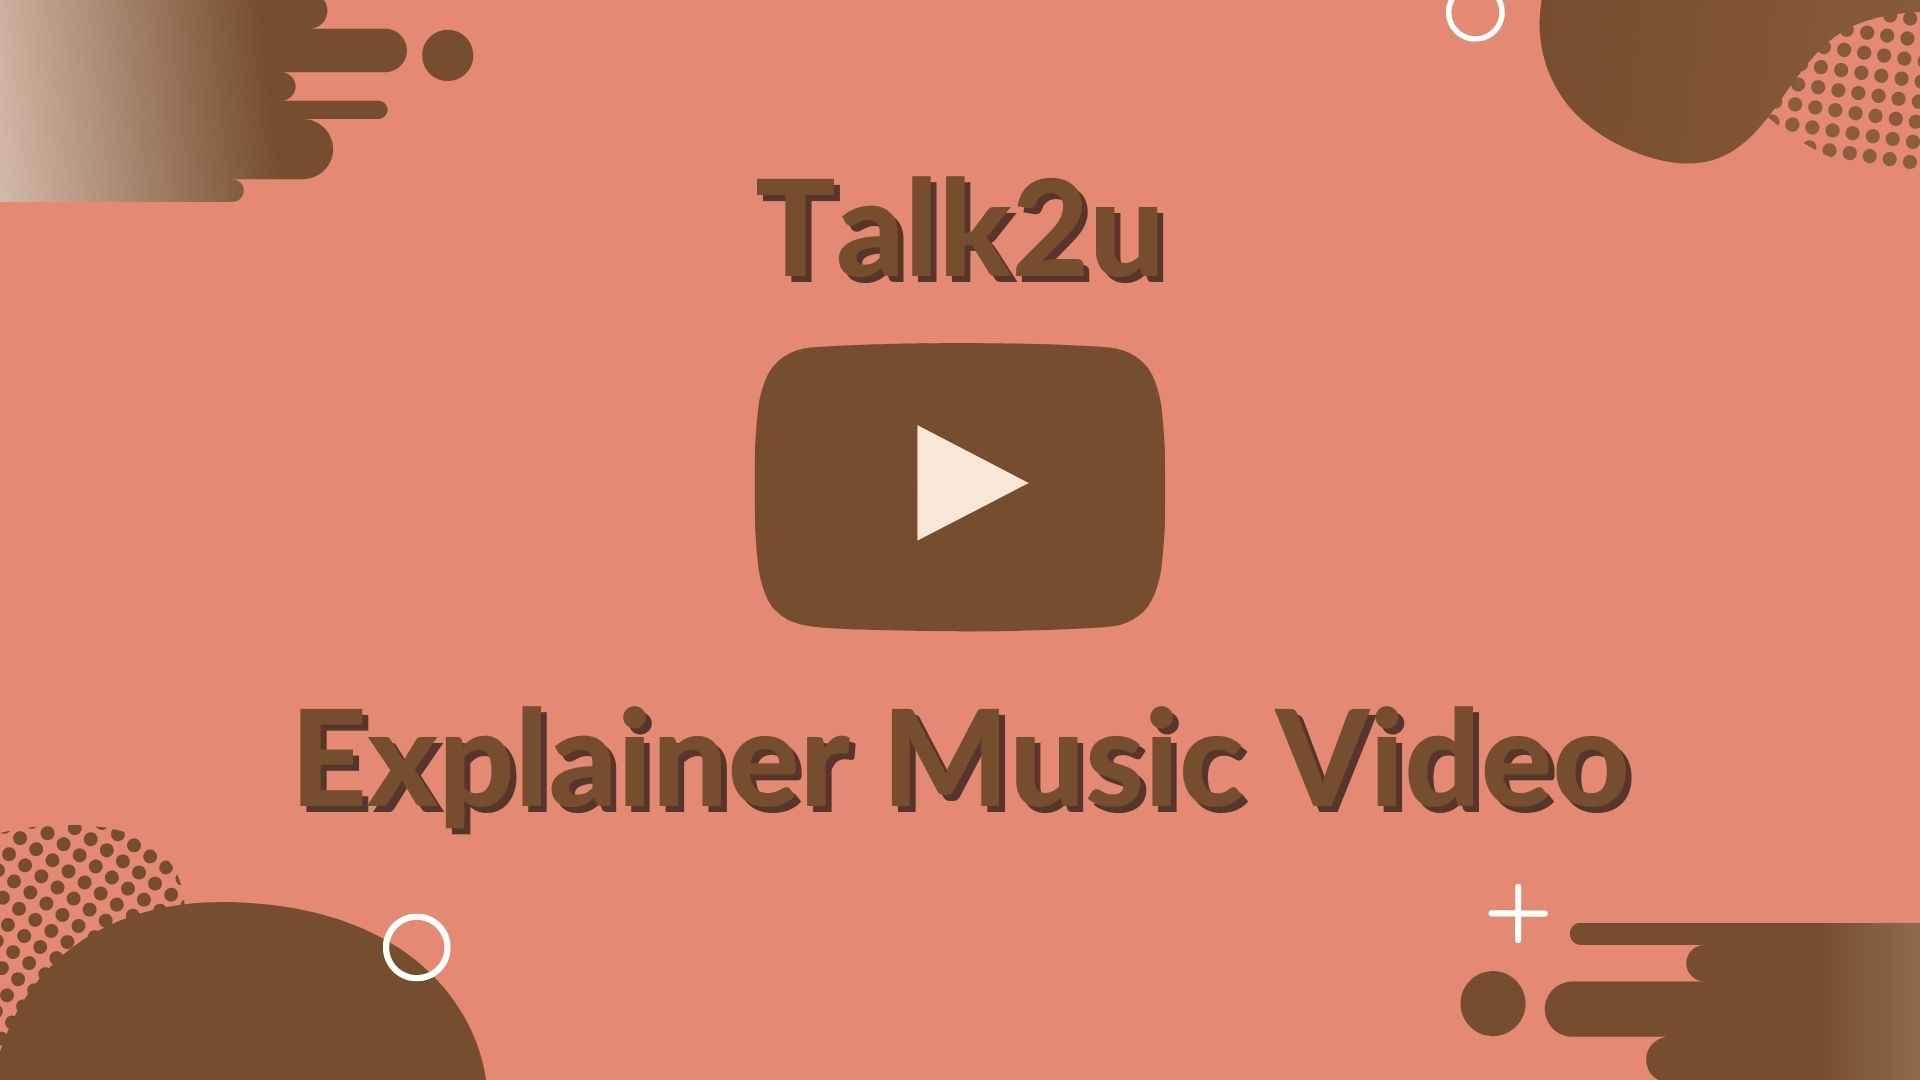 Talk2u Explainer Music Video